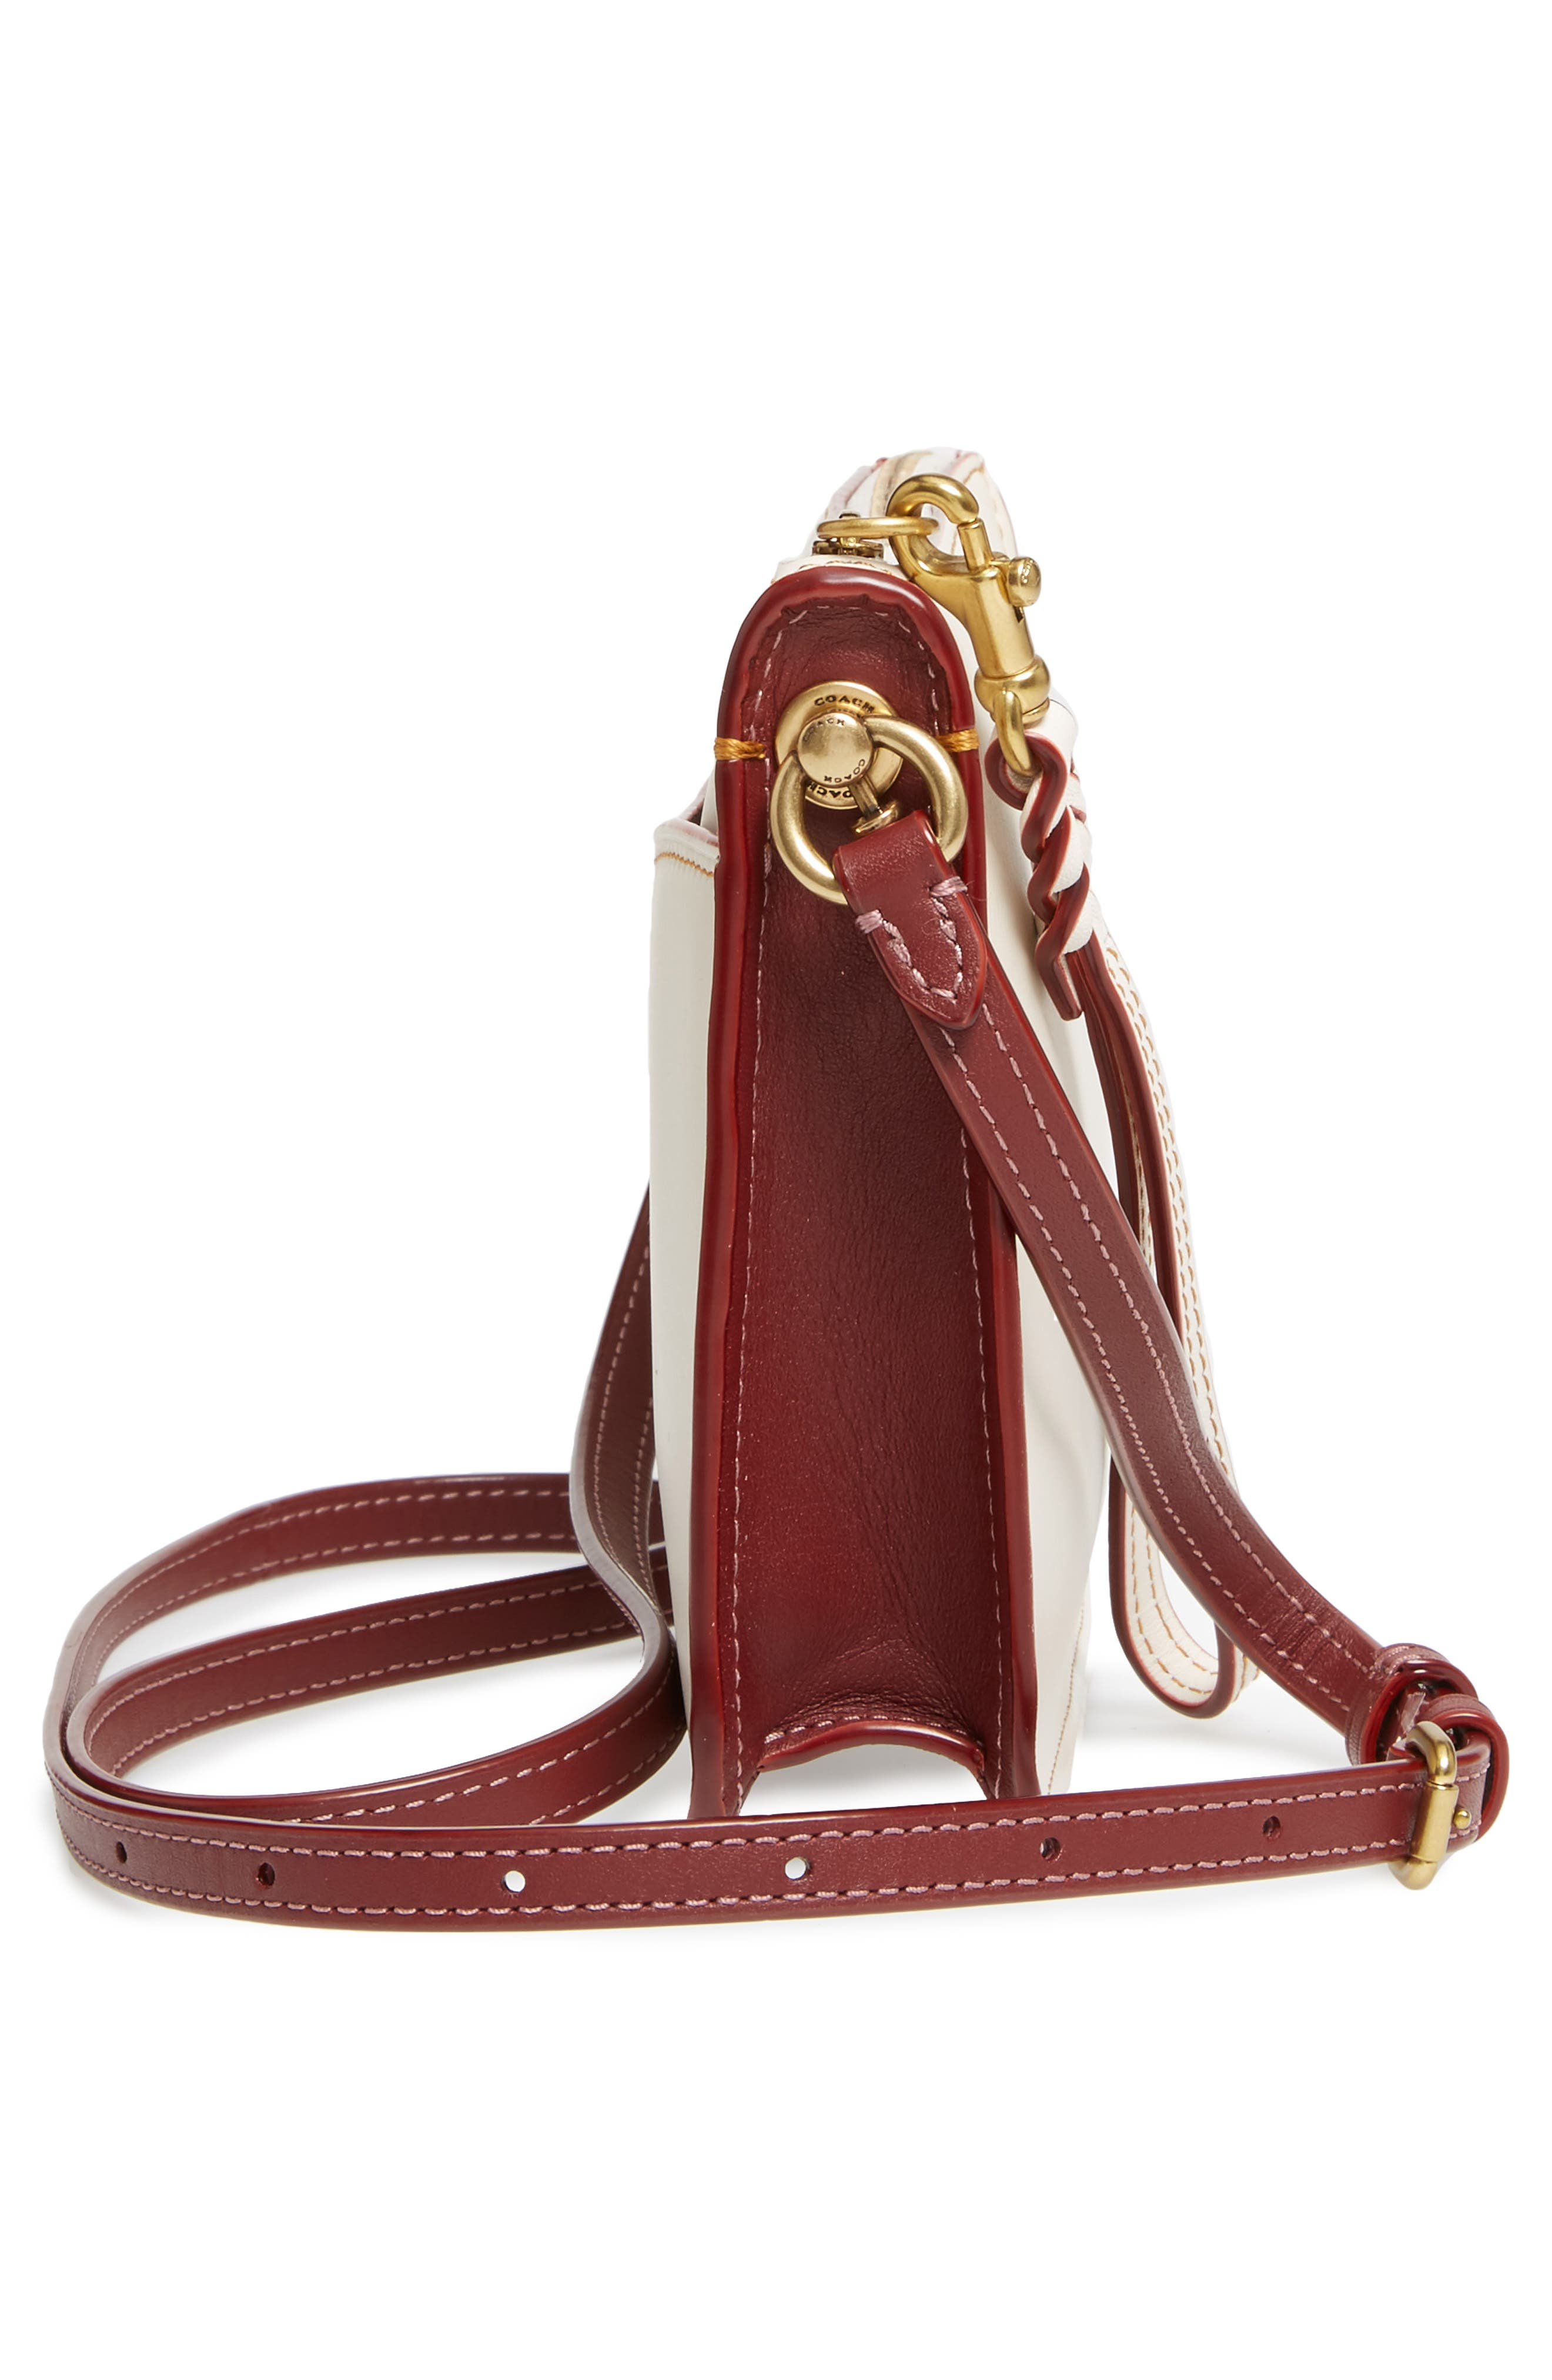 Colorblock Soho Leather Crossbody Bag,                             Alternate thumbnail 5, color,                             250